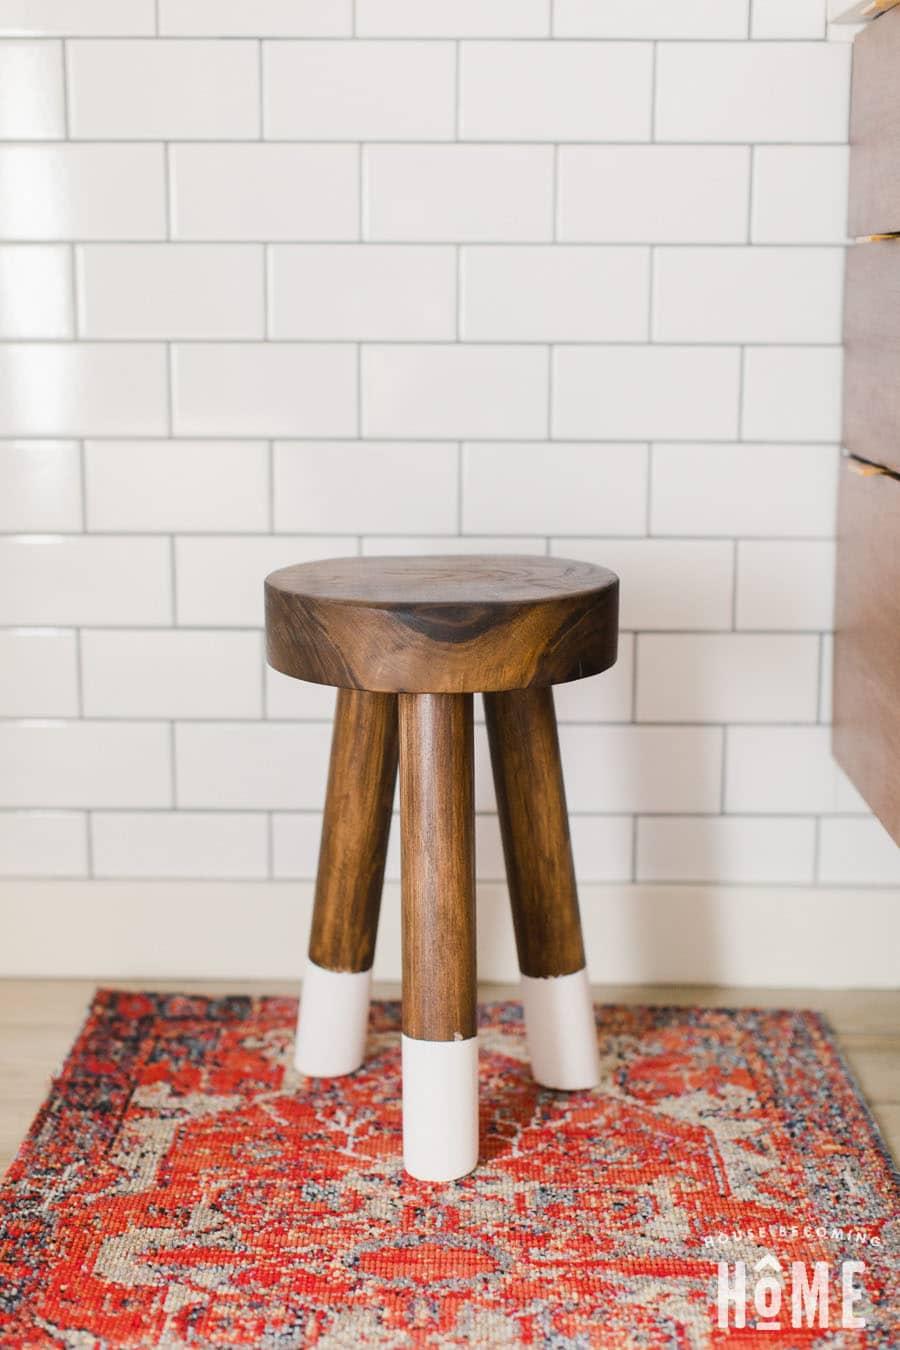 How to build a DIY three legged stool dip-dyed walnut